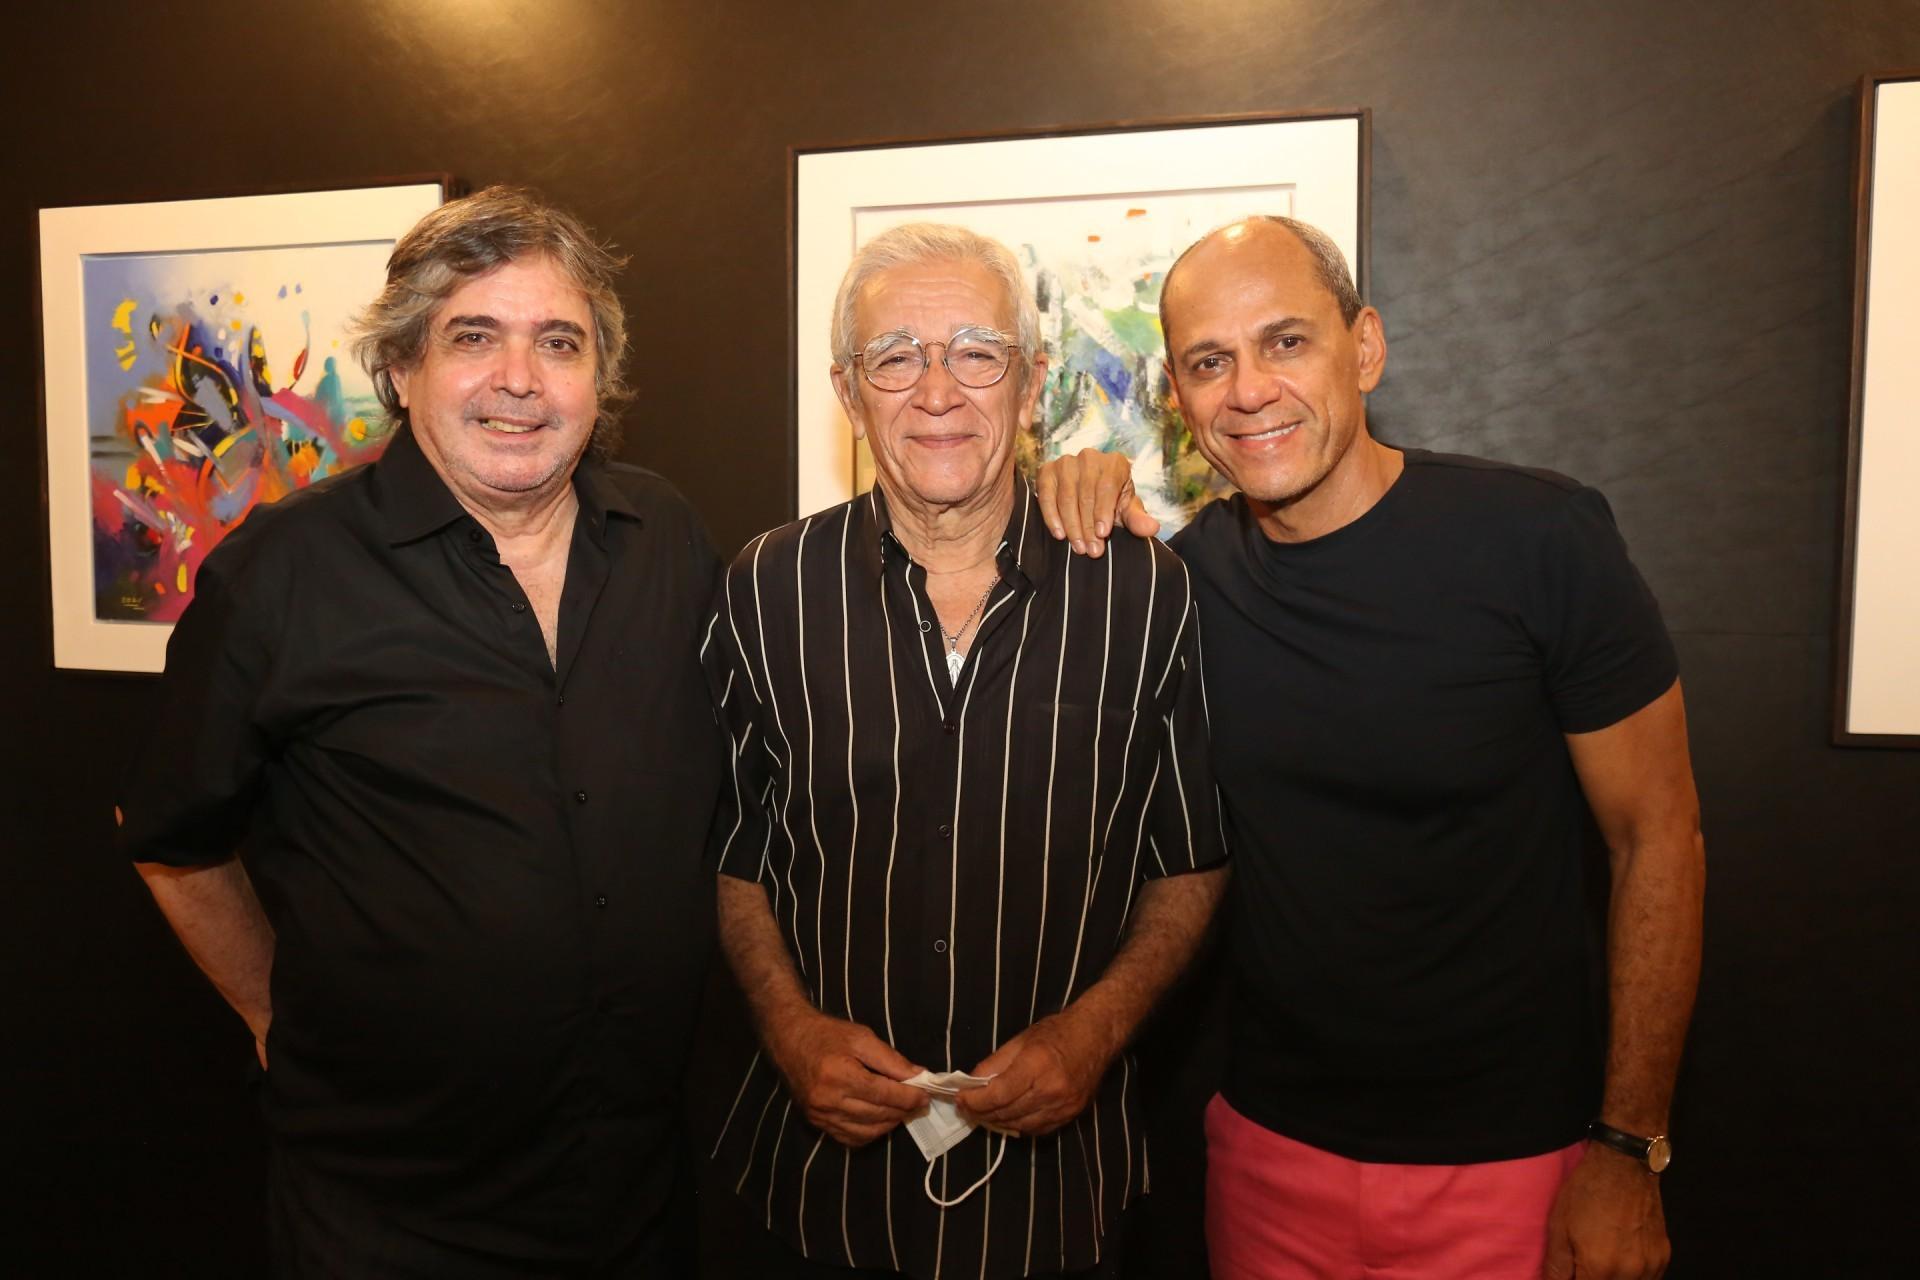 Totonho Laprovitera, Mino Castelo Branco e Mano Alencar (Foto: JOÃO FILHO TAVARES)